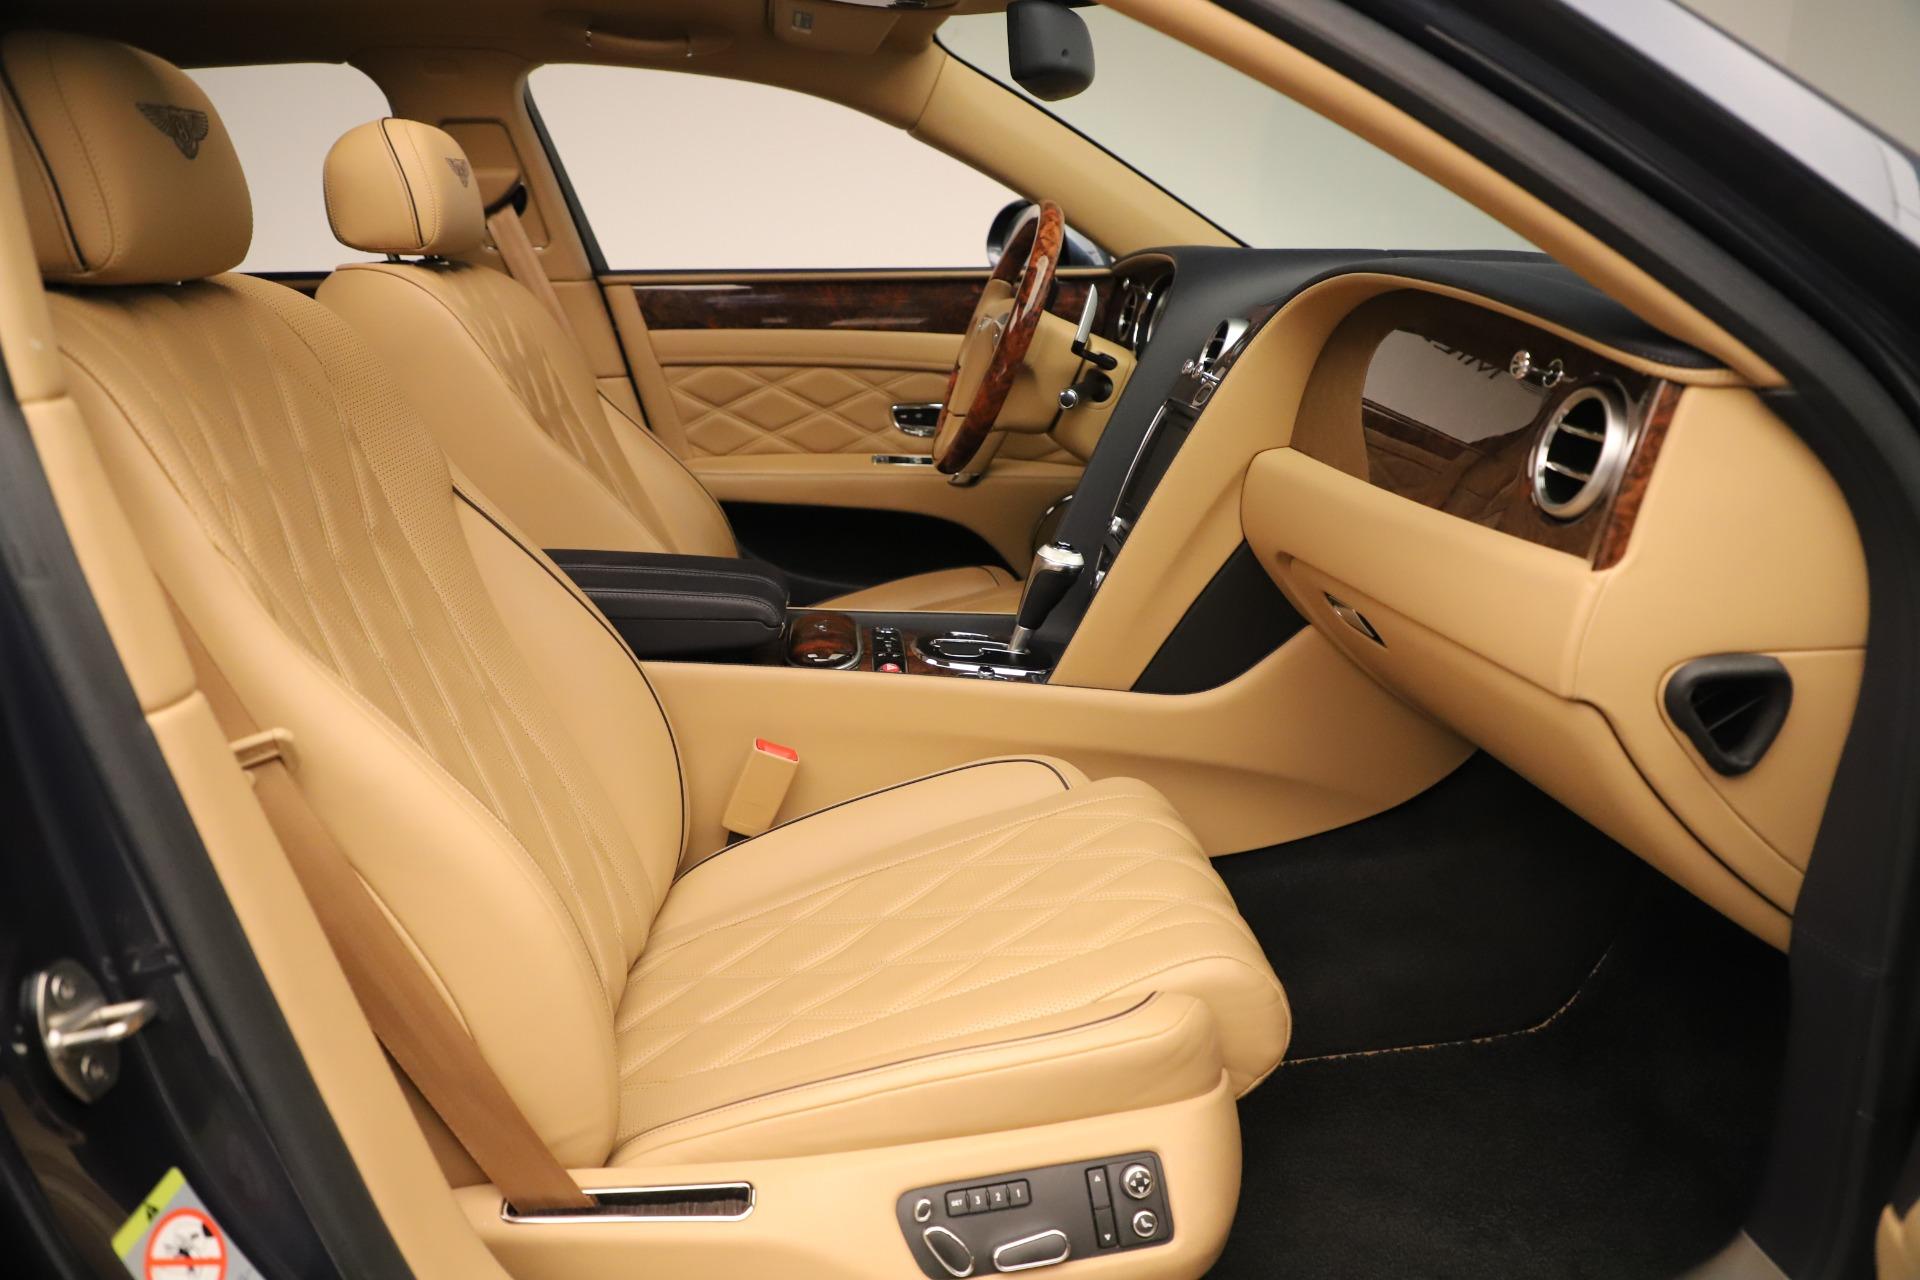 Used 2016 Bentley Flying Spur W12 For Sale In Westport, CT 3171_p27